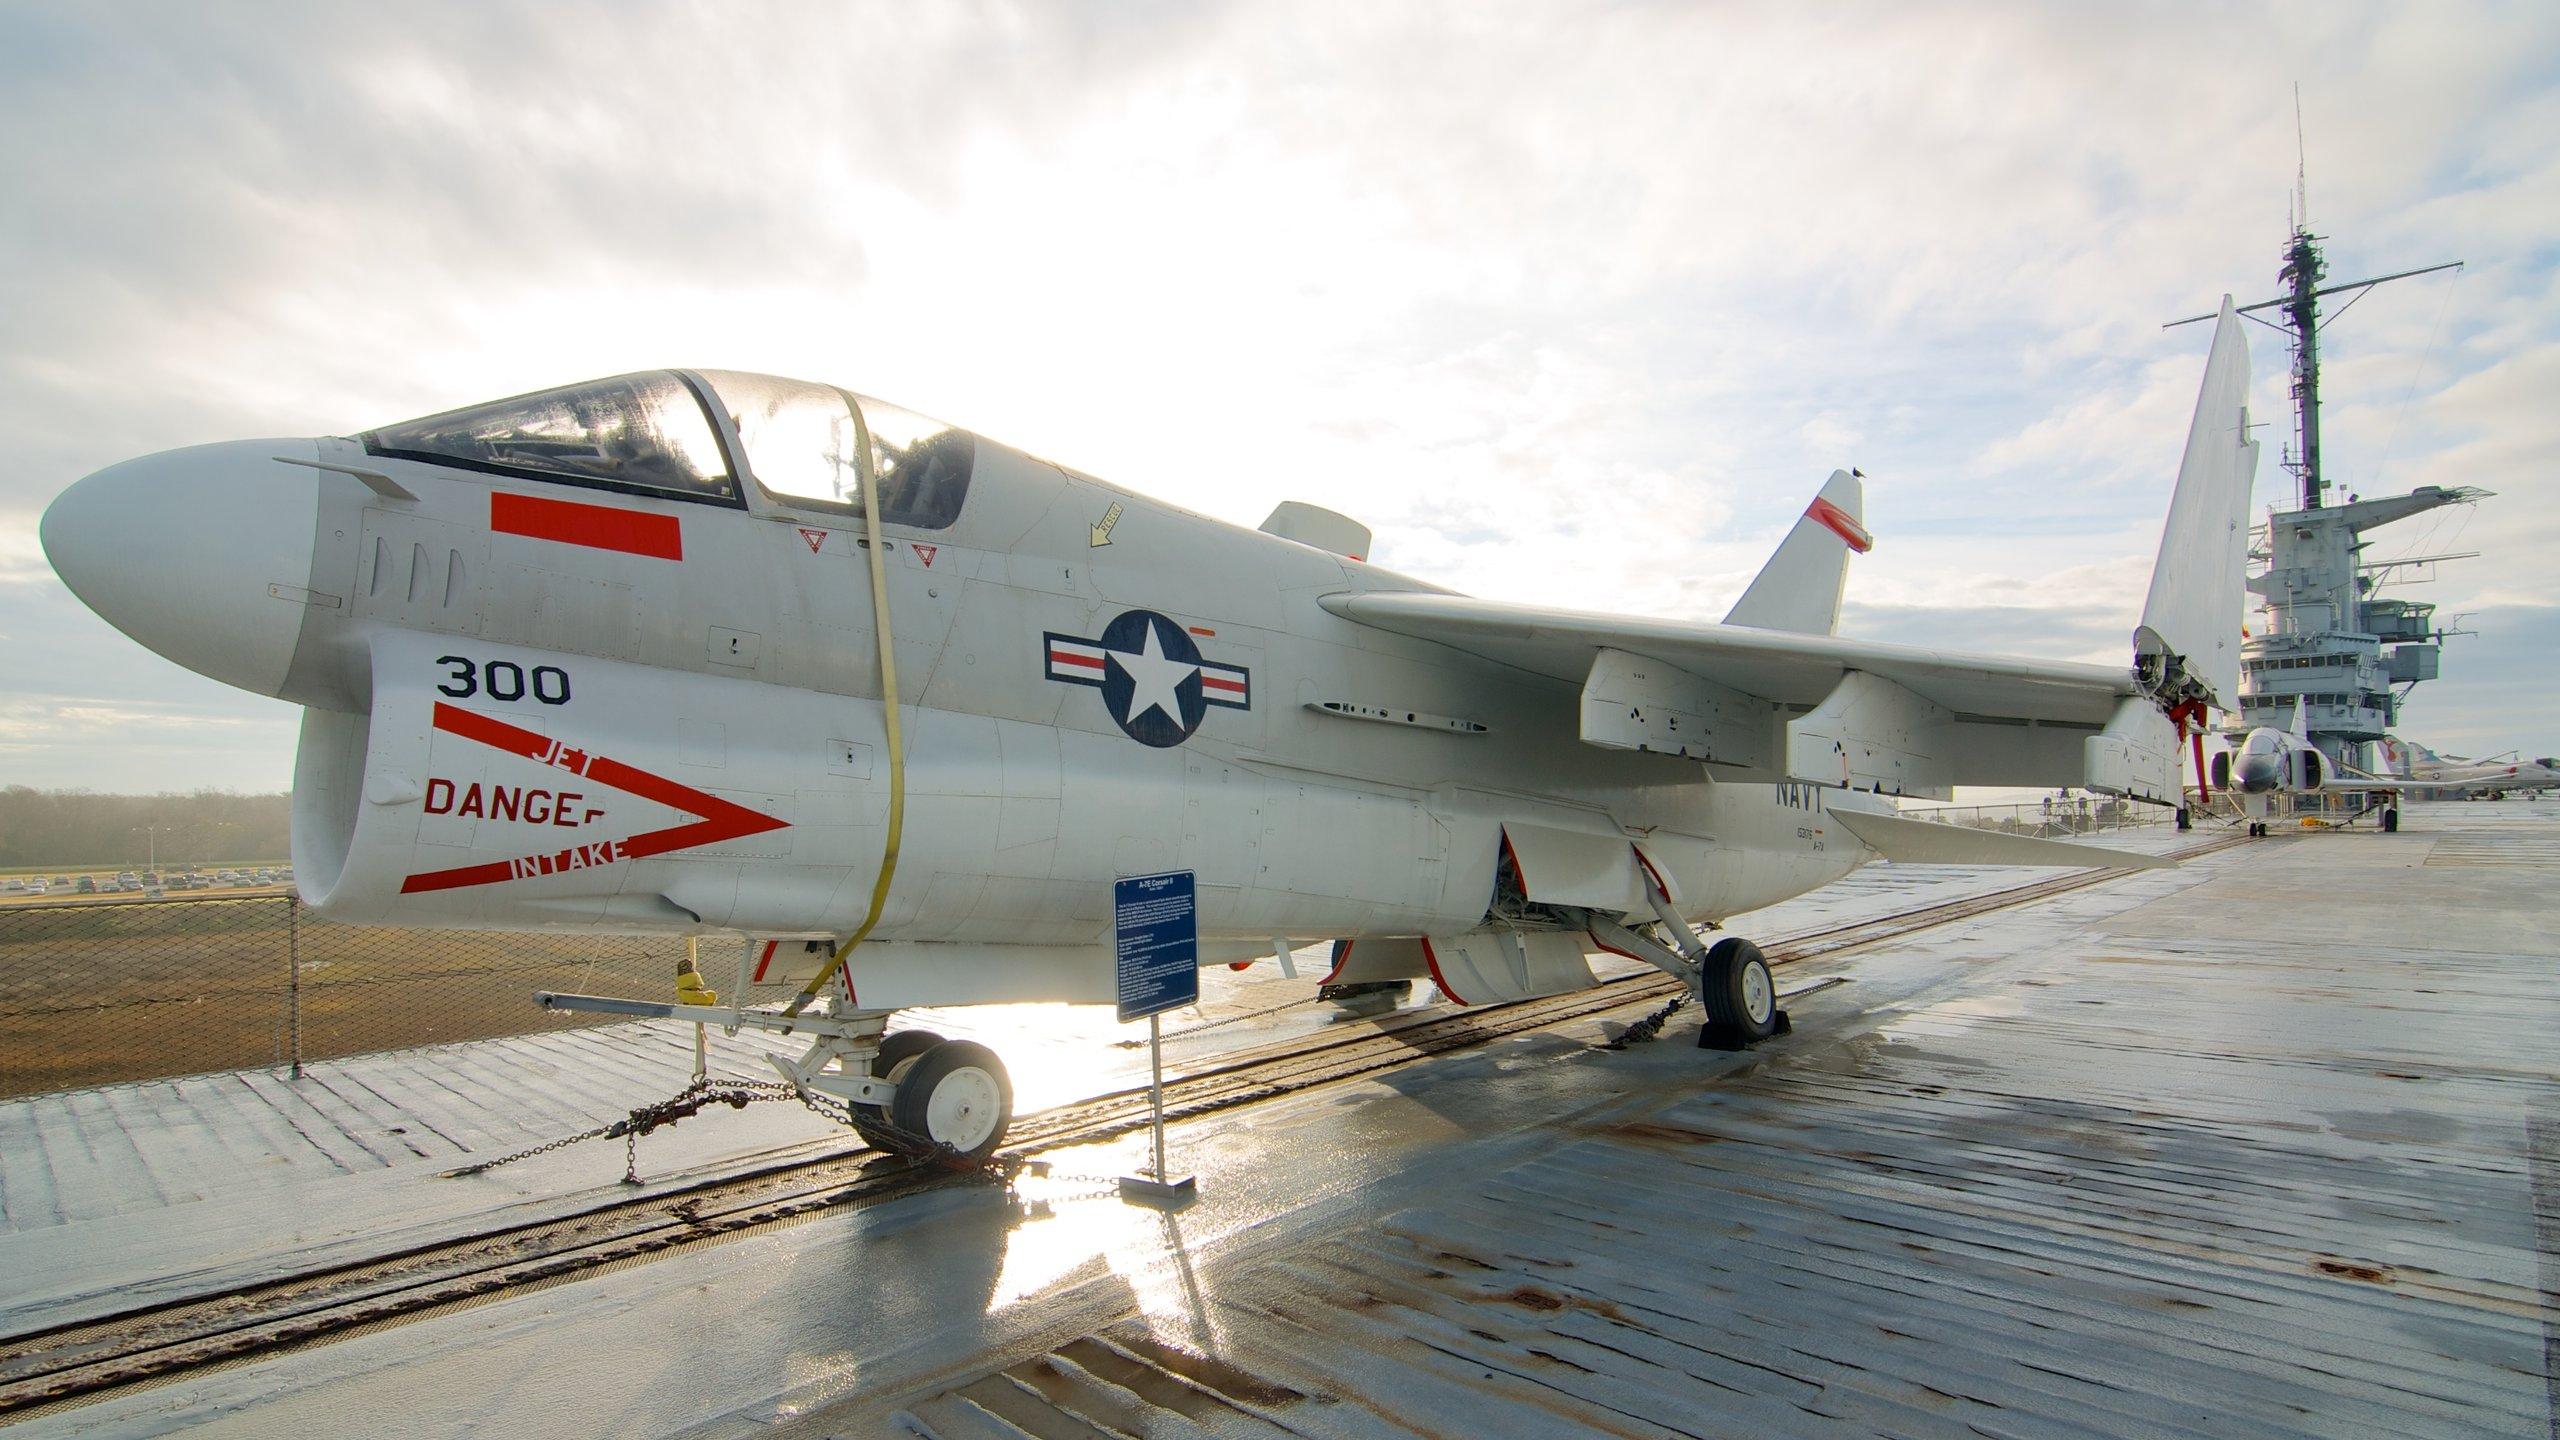 USS Yorktown, Mount Pleasant, South Carolina, USA